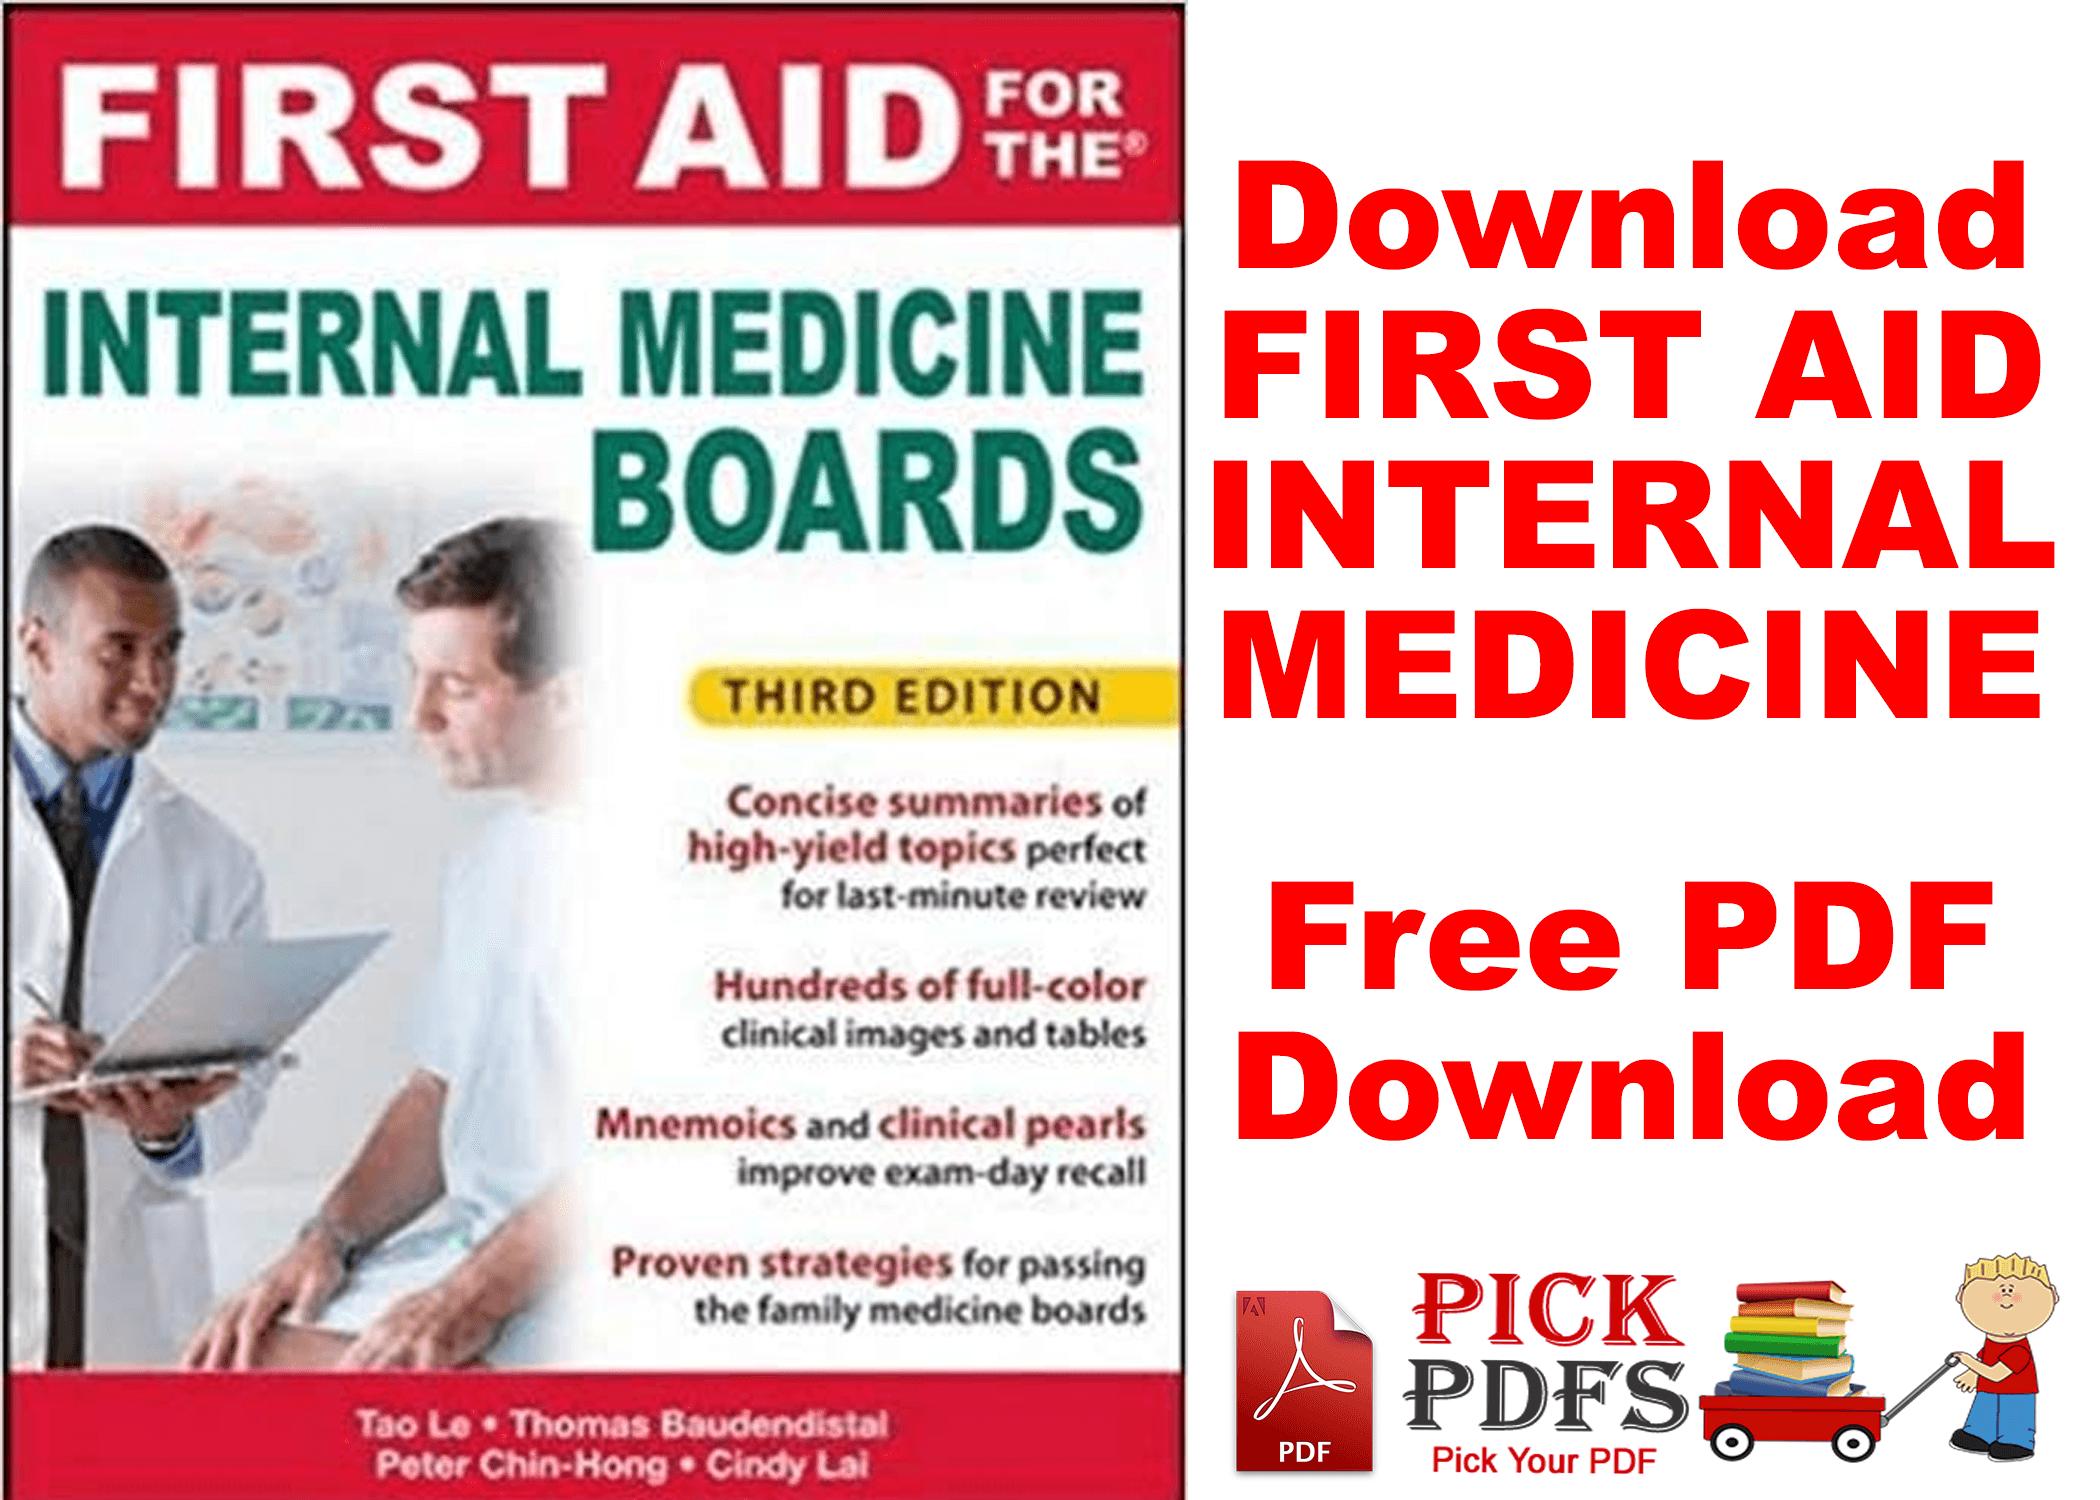 https://pickpdfs.com/harrisons-principles-of-internal-medicine-19th-edition-pdf-free-pdf-pickpdfs-medical-books/